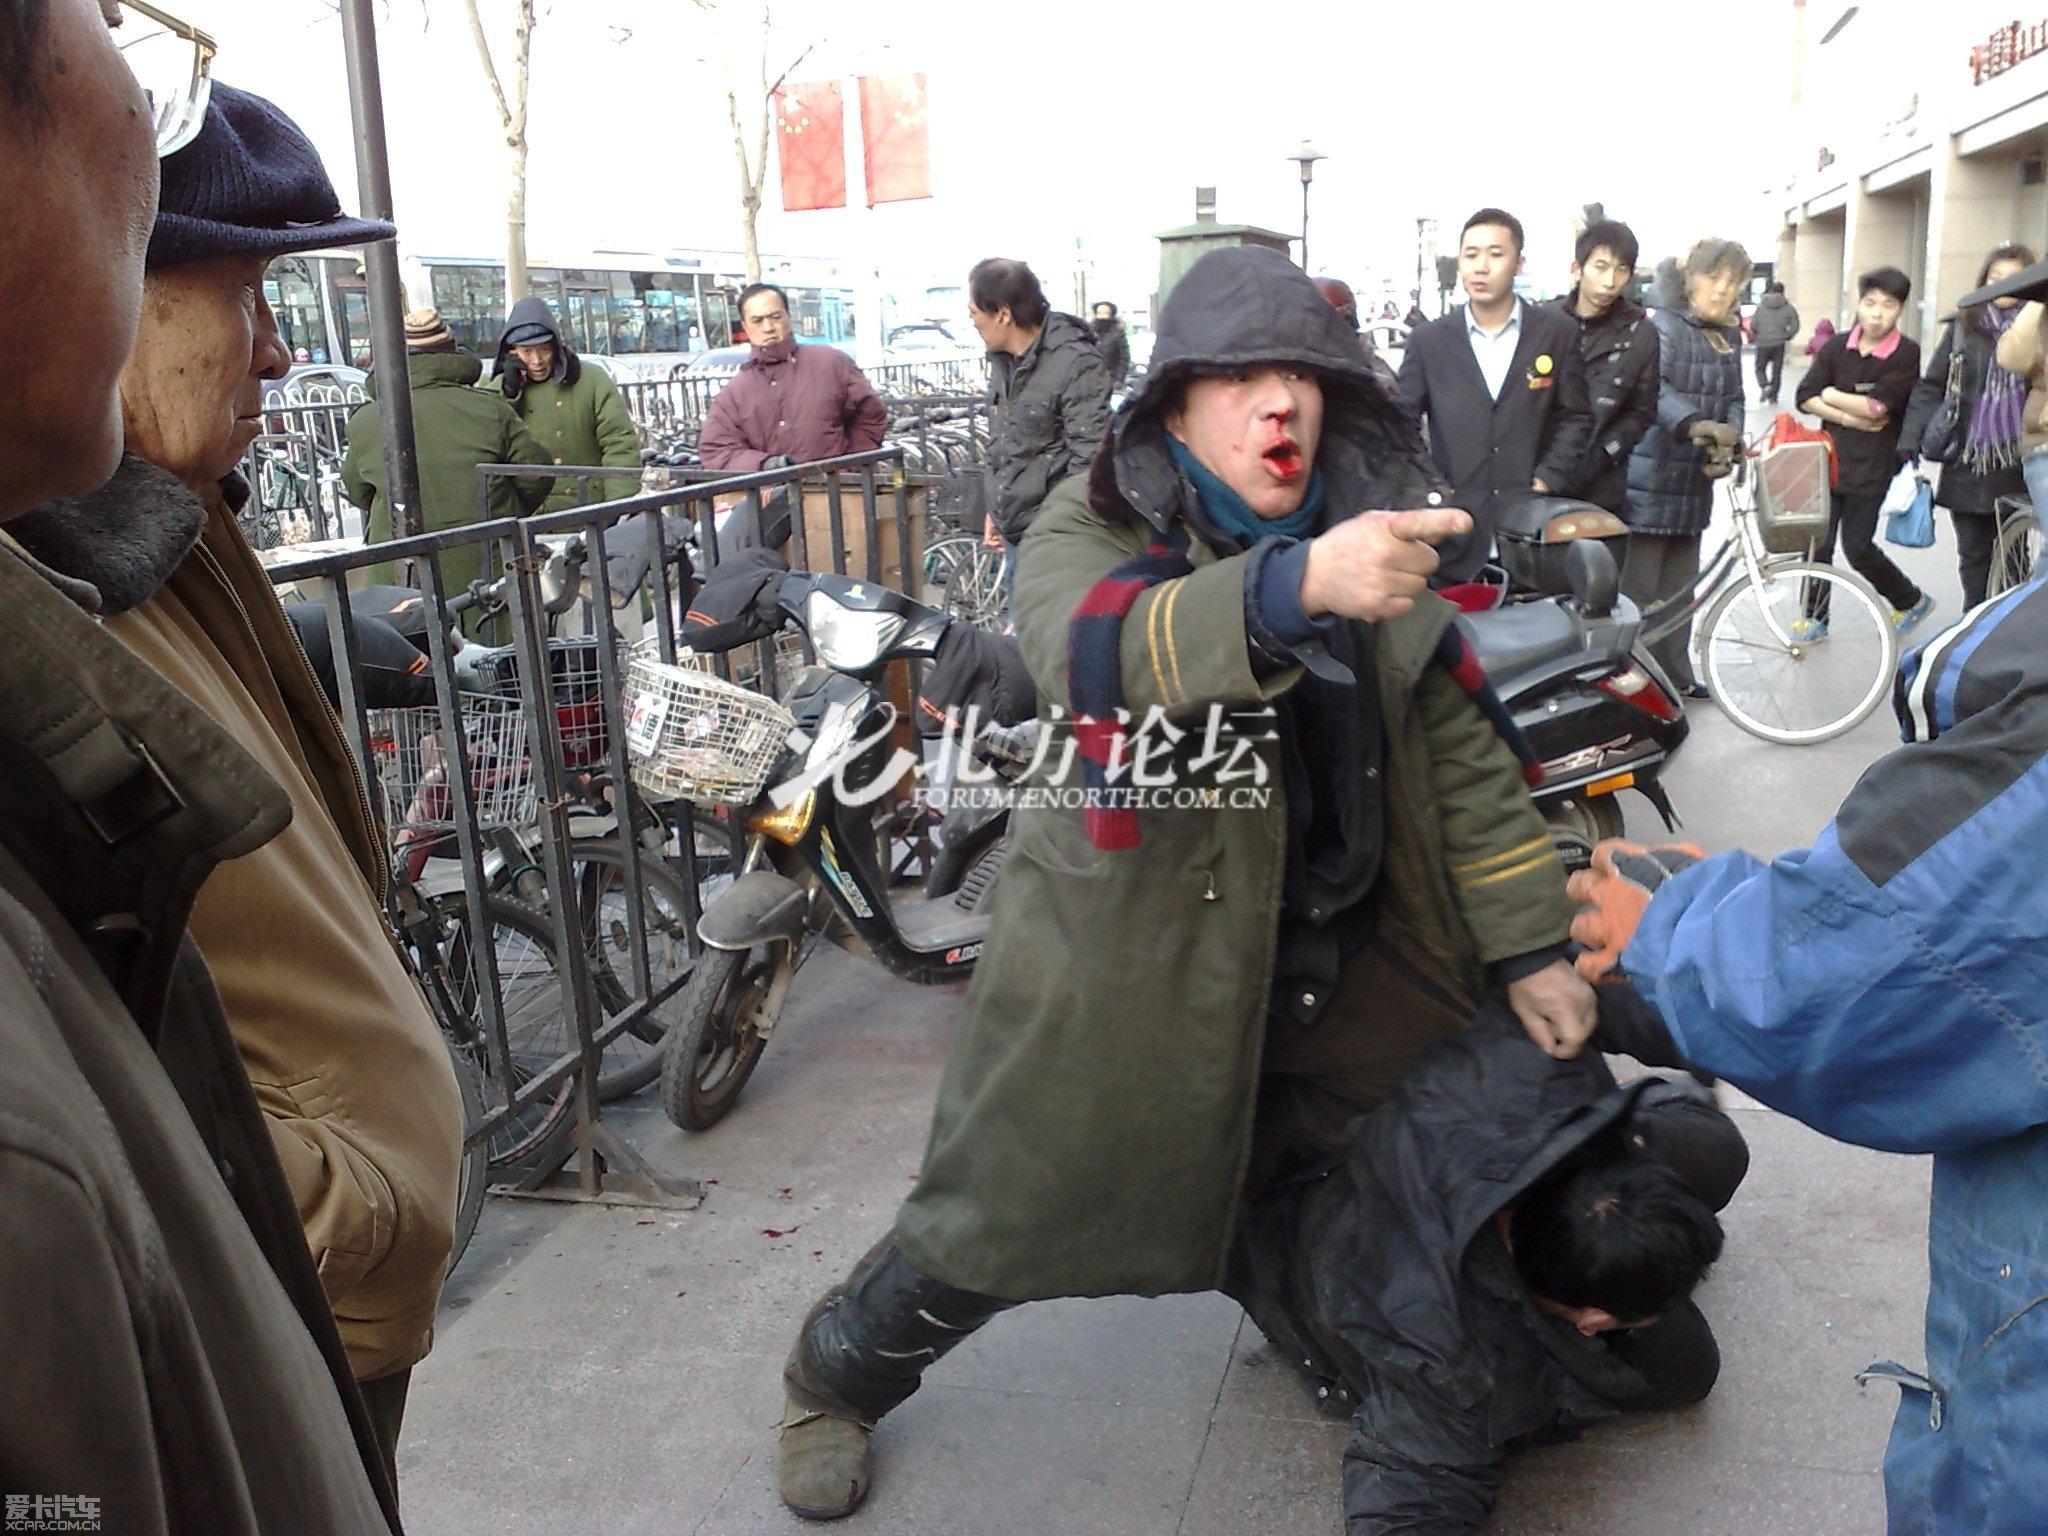 v5 天津汽车论坛 xcar 爱卡汽车俱乐部高清图片